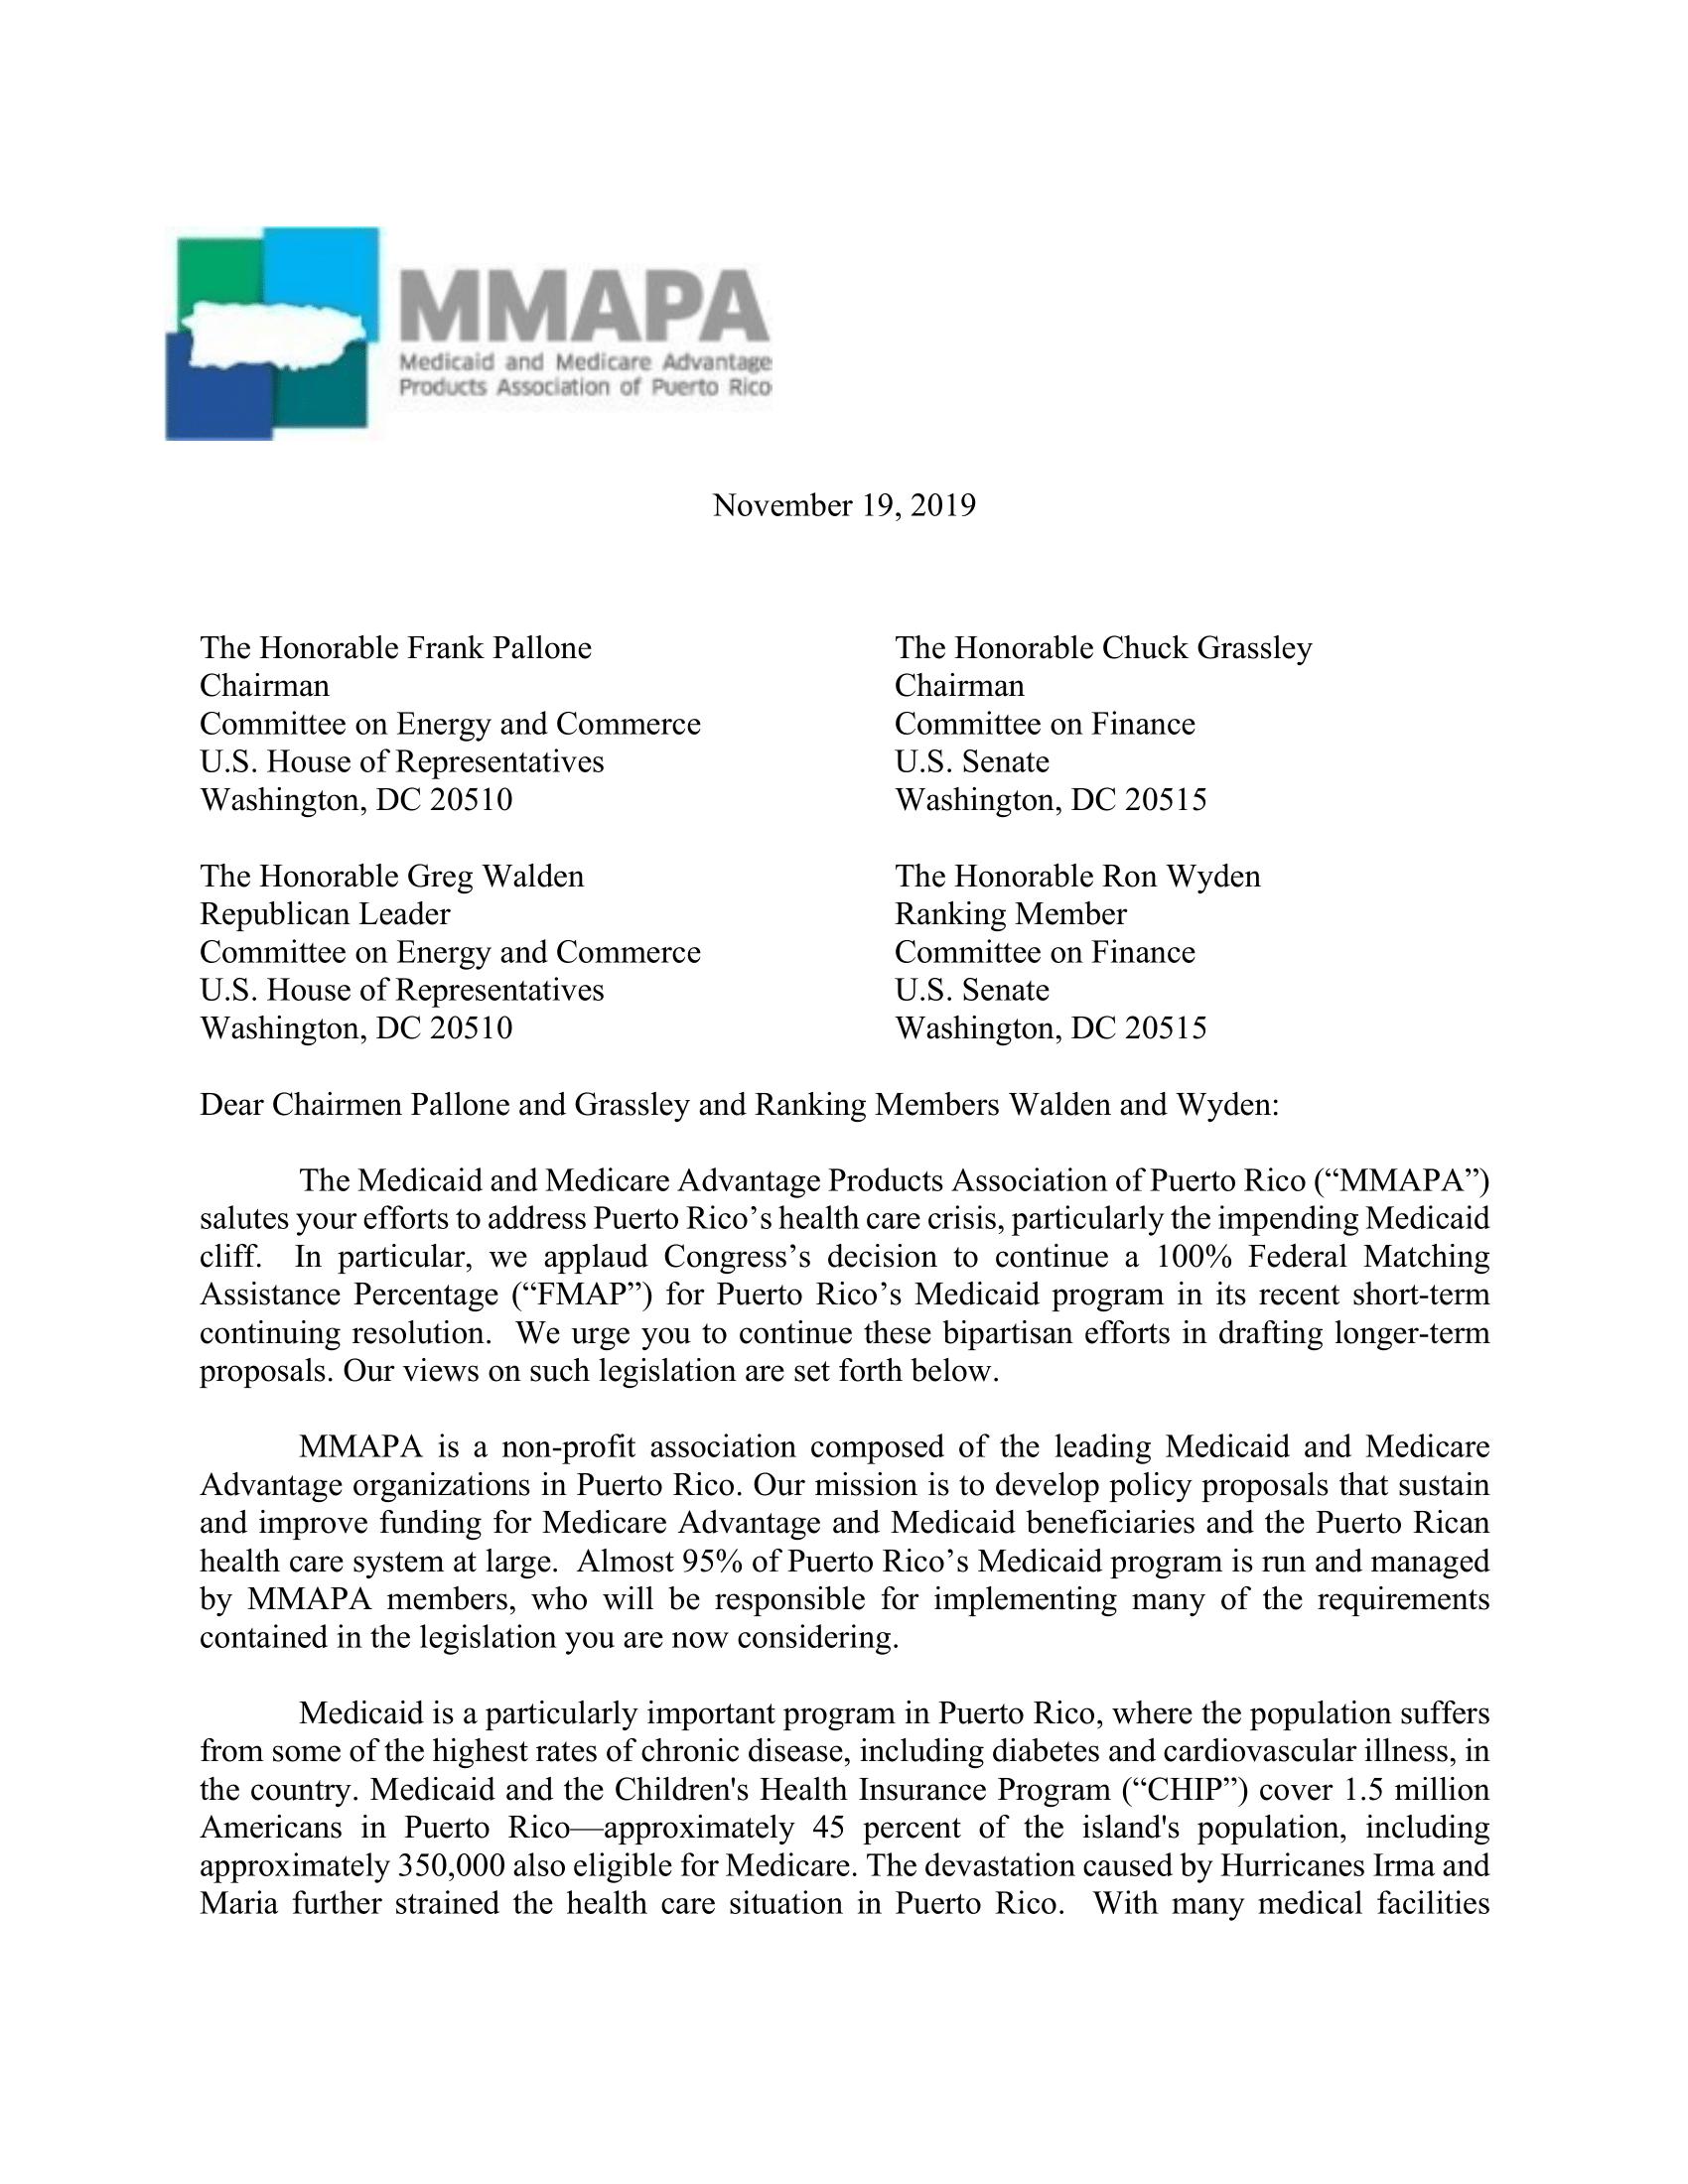 MMAPA Pallone-Walden-Grassley-Wyden Letter FINAL-1